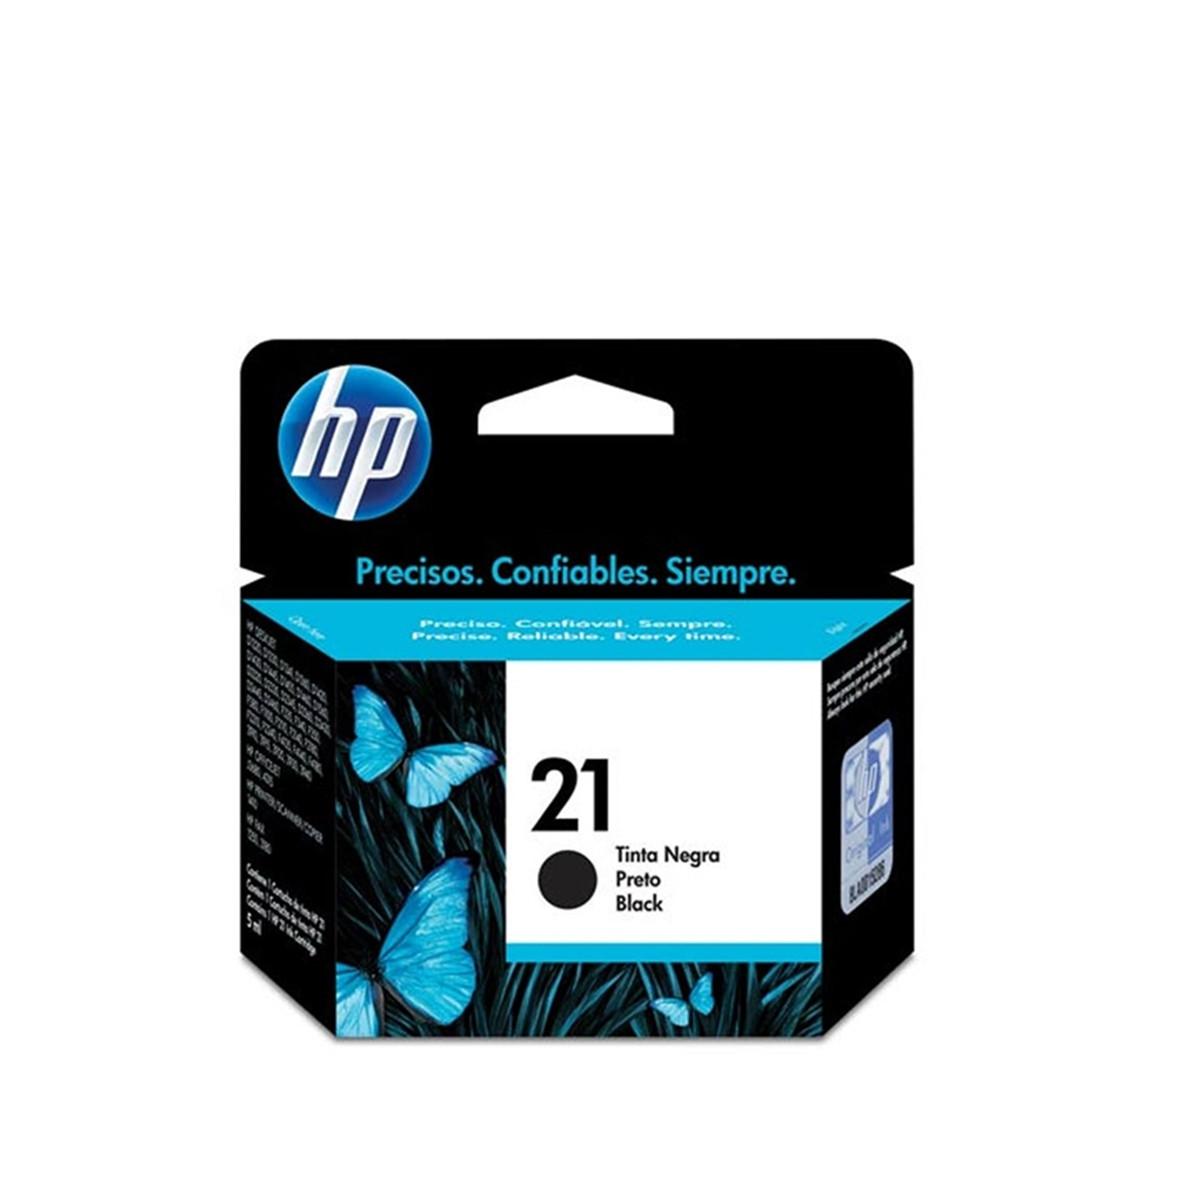 Cartucho de Tinta HP 21 | C9351A, C9351AB | Preto | Original HP | 7ml